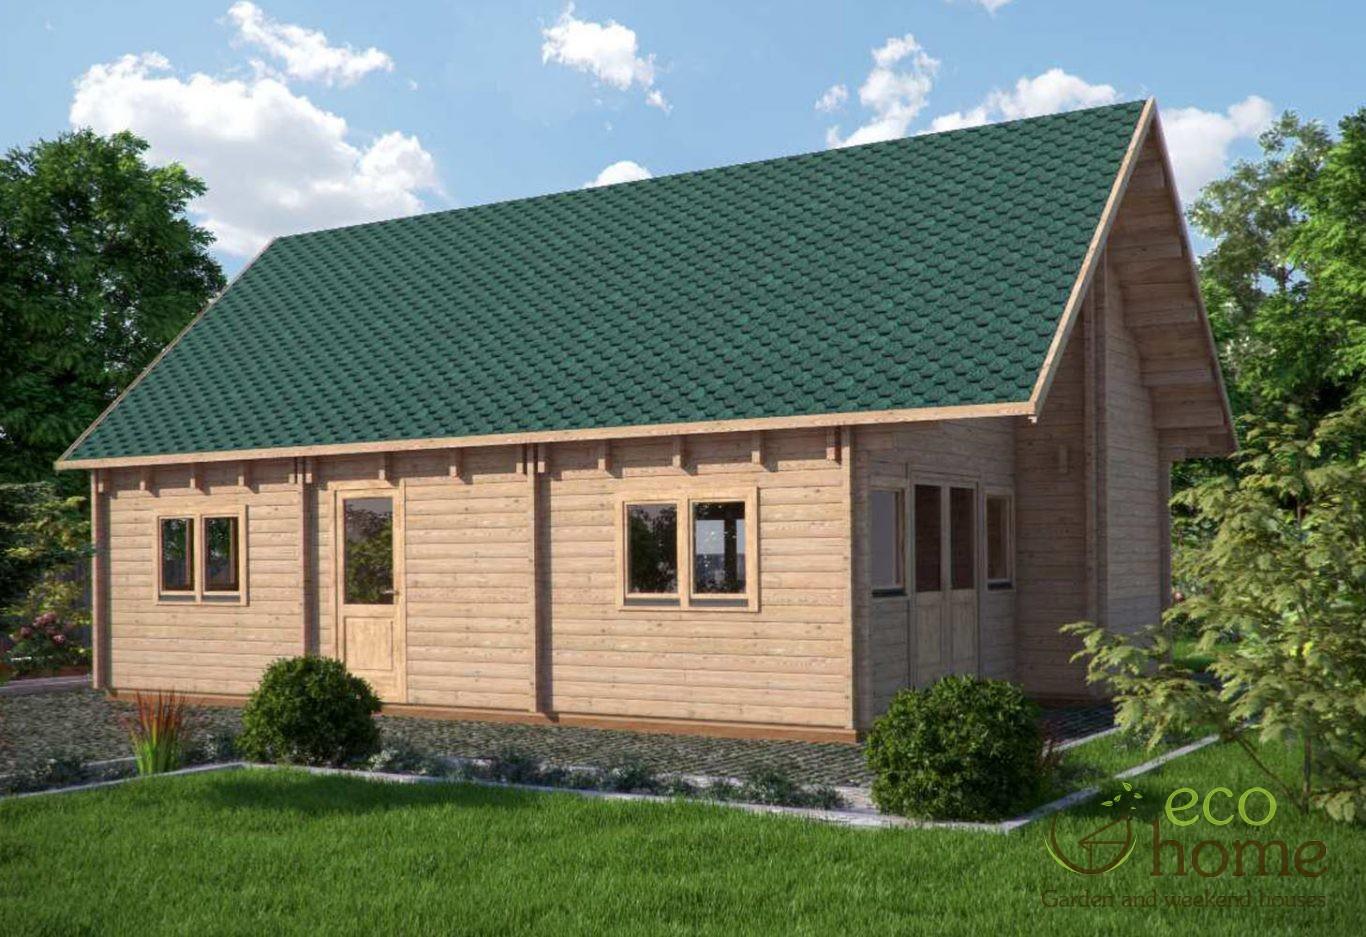 Two storey four bed log cabin felix 6m x 10m log cabins for Two storey log cabin